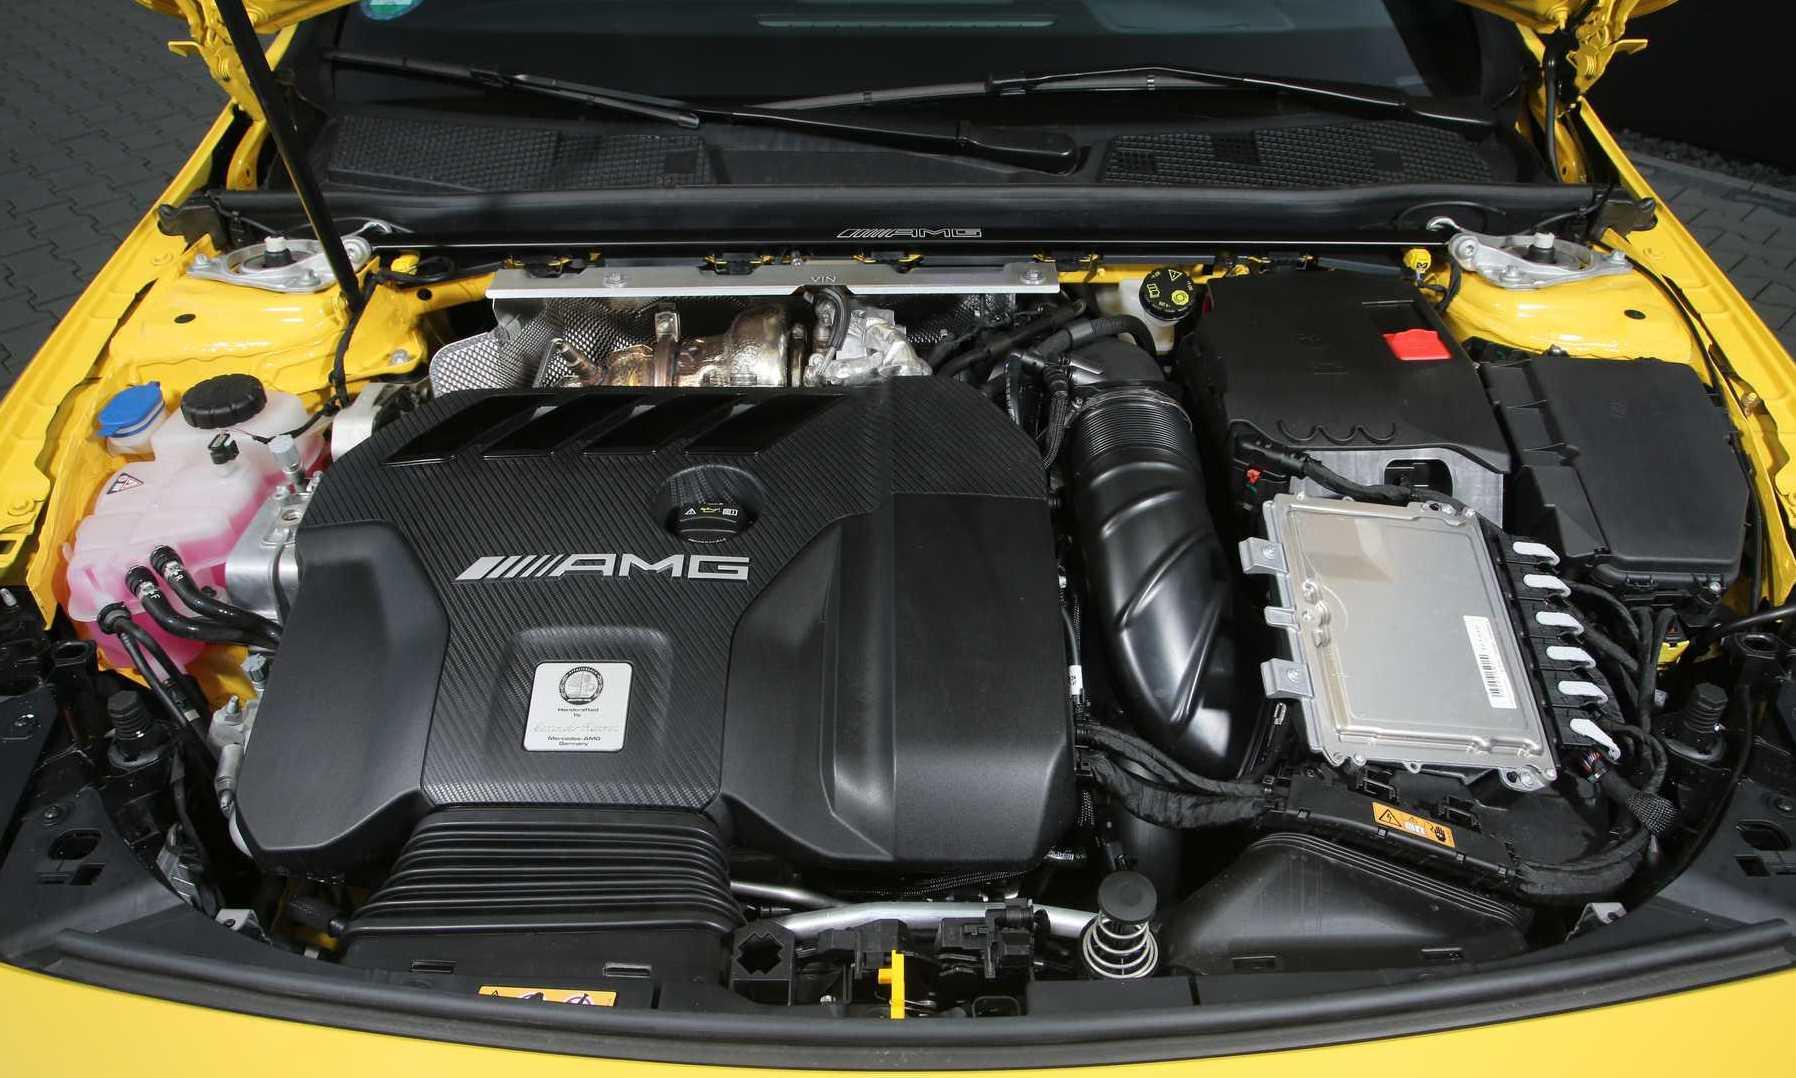 Posaidon Mercedes-AMG A45 engine